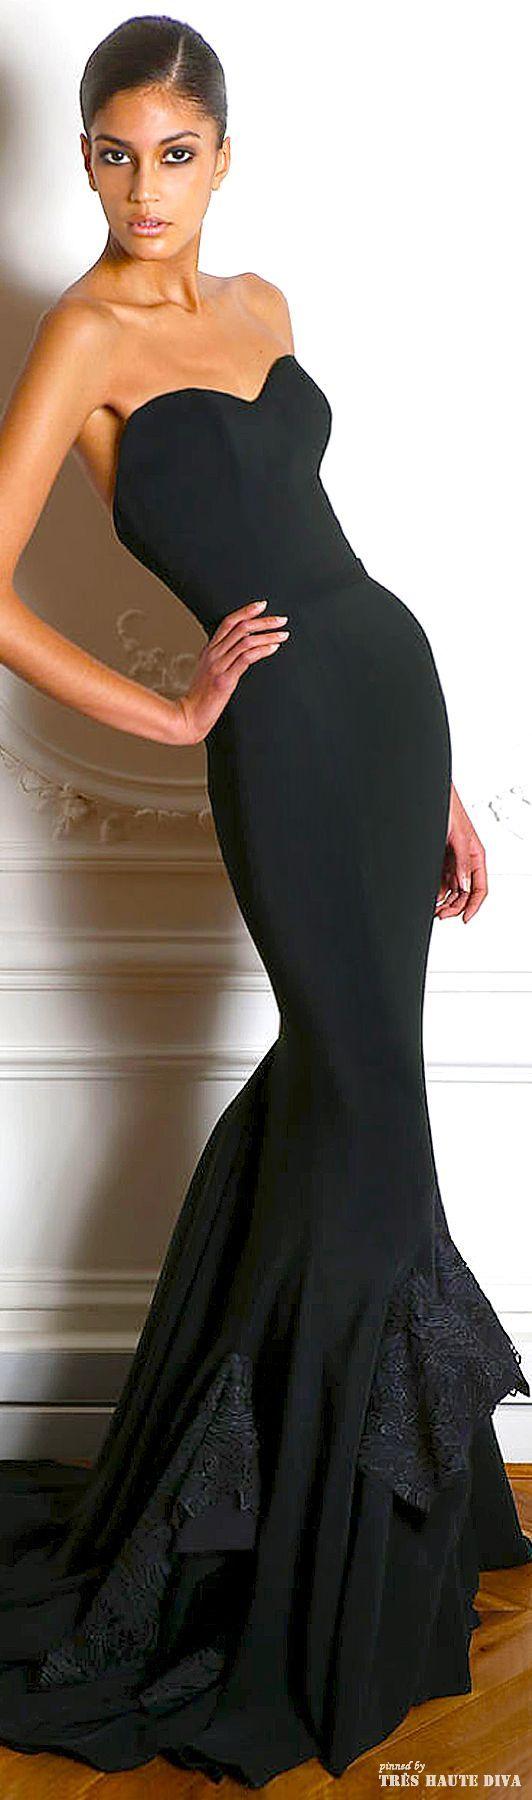 Paris Fashion Week formal dresses short,formal dress short | Formals ...